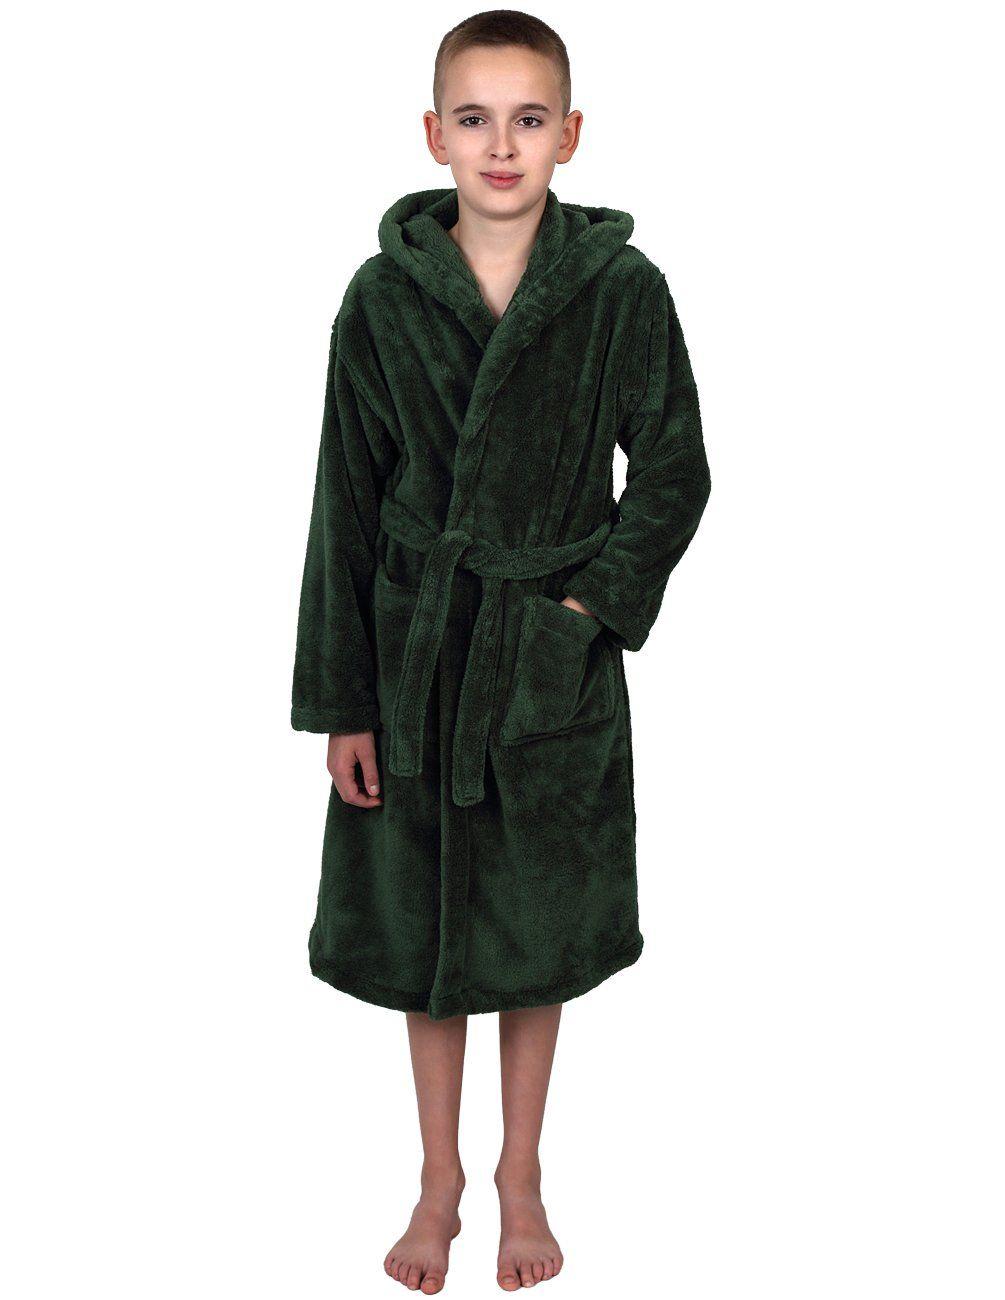 TowelSelections Big Boys' Hooded Plush Robe Soft Fleece